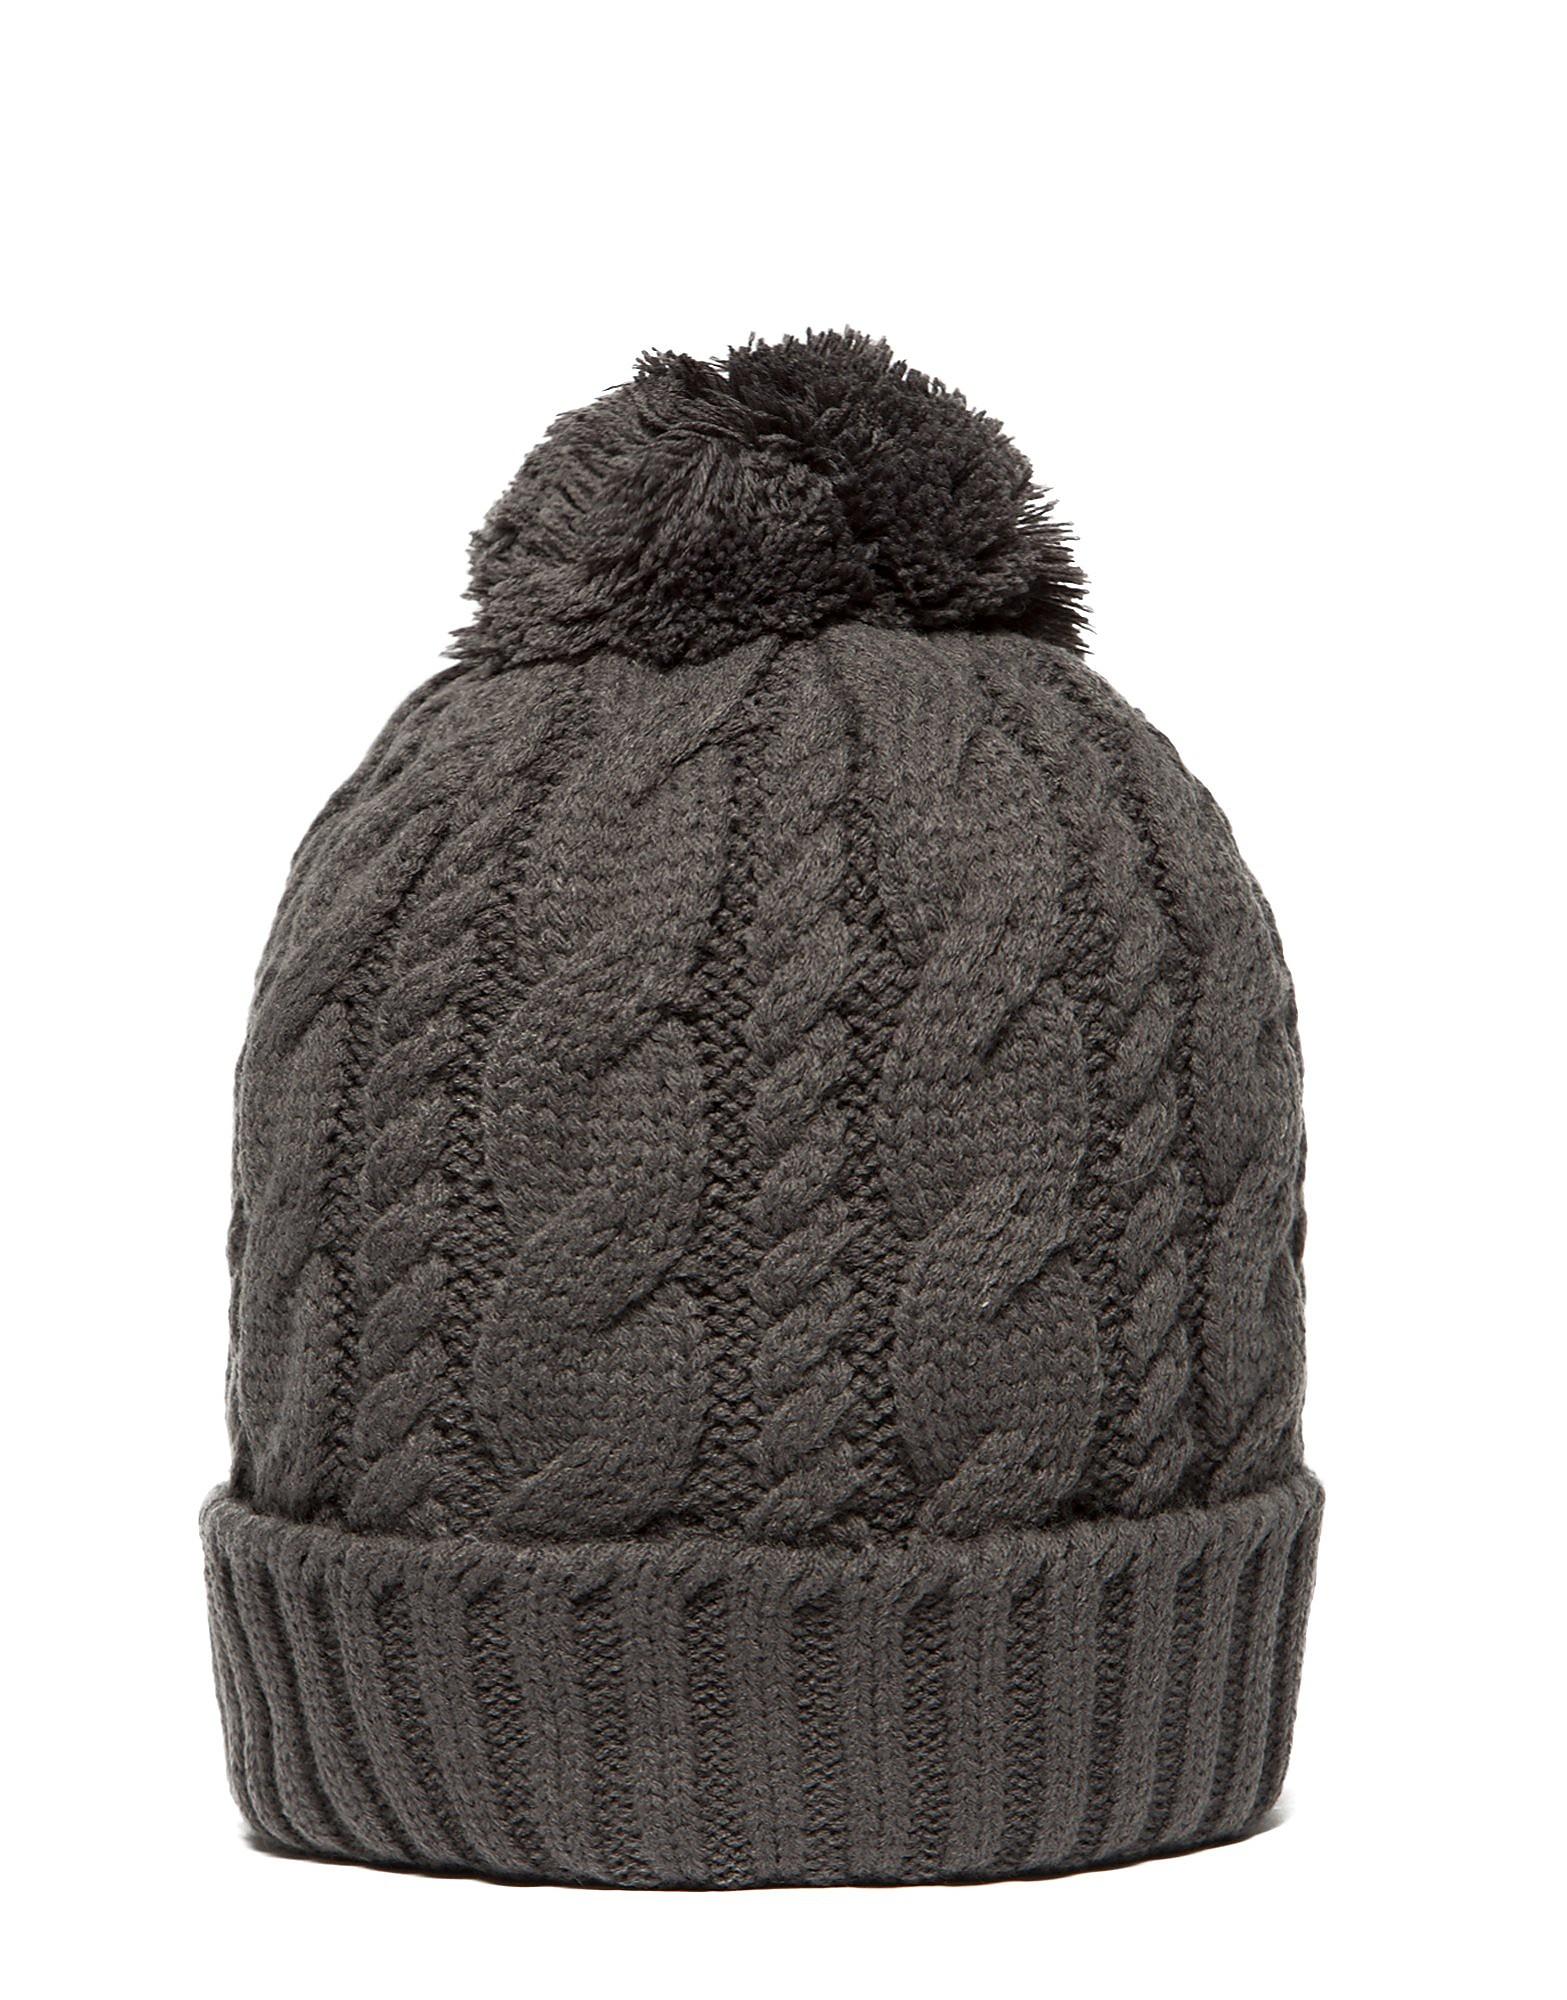 Duffer of St George Benson Beanie Hat